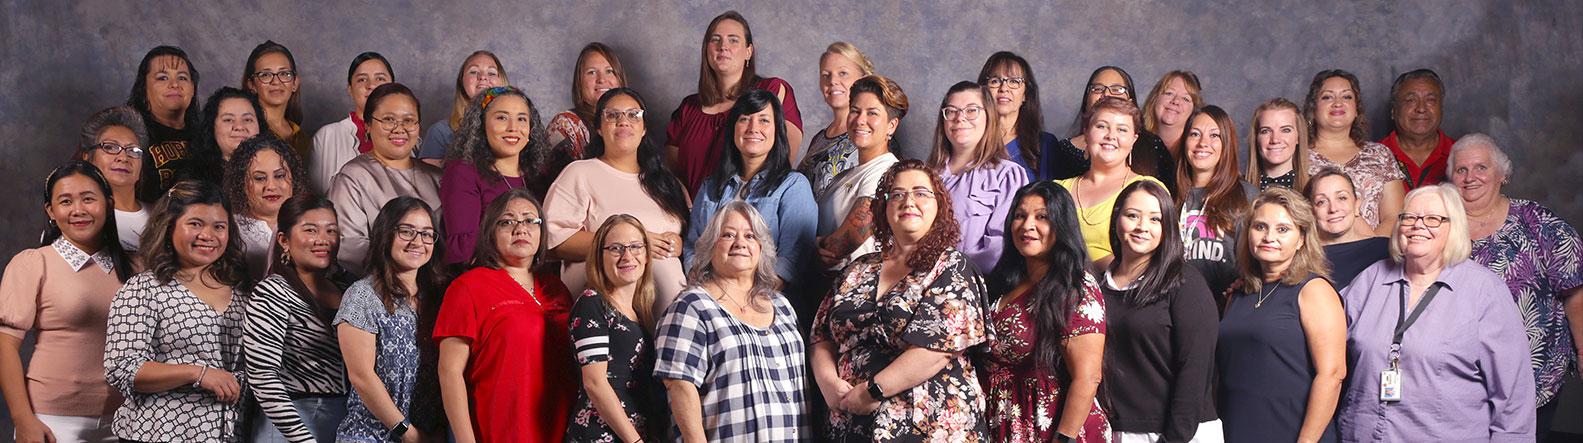 2021-2022 Altar Valley School District teachers and staff